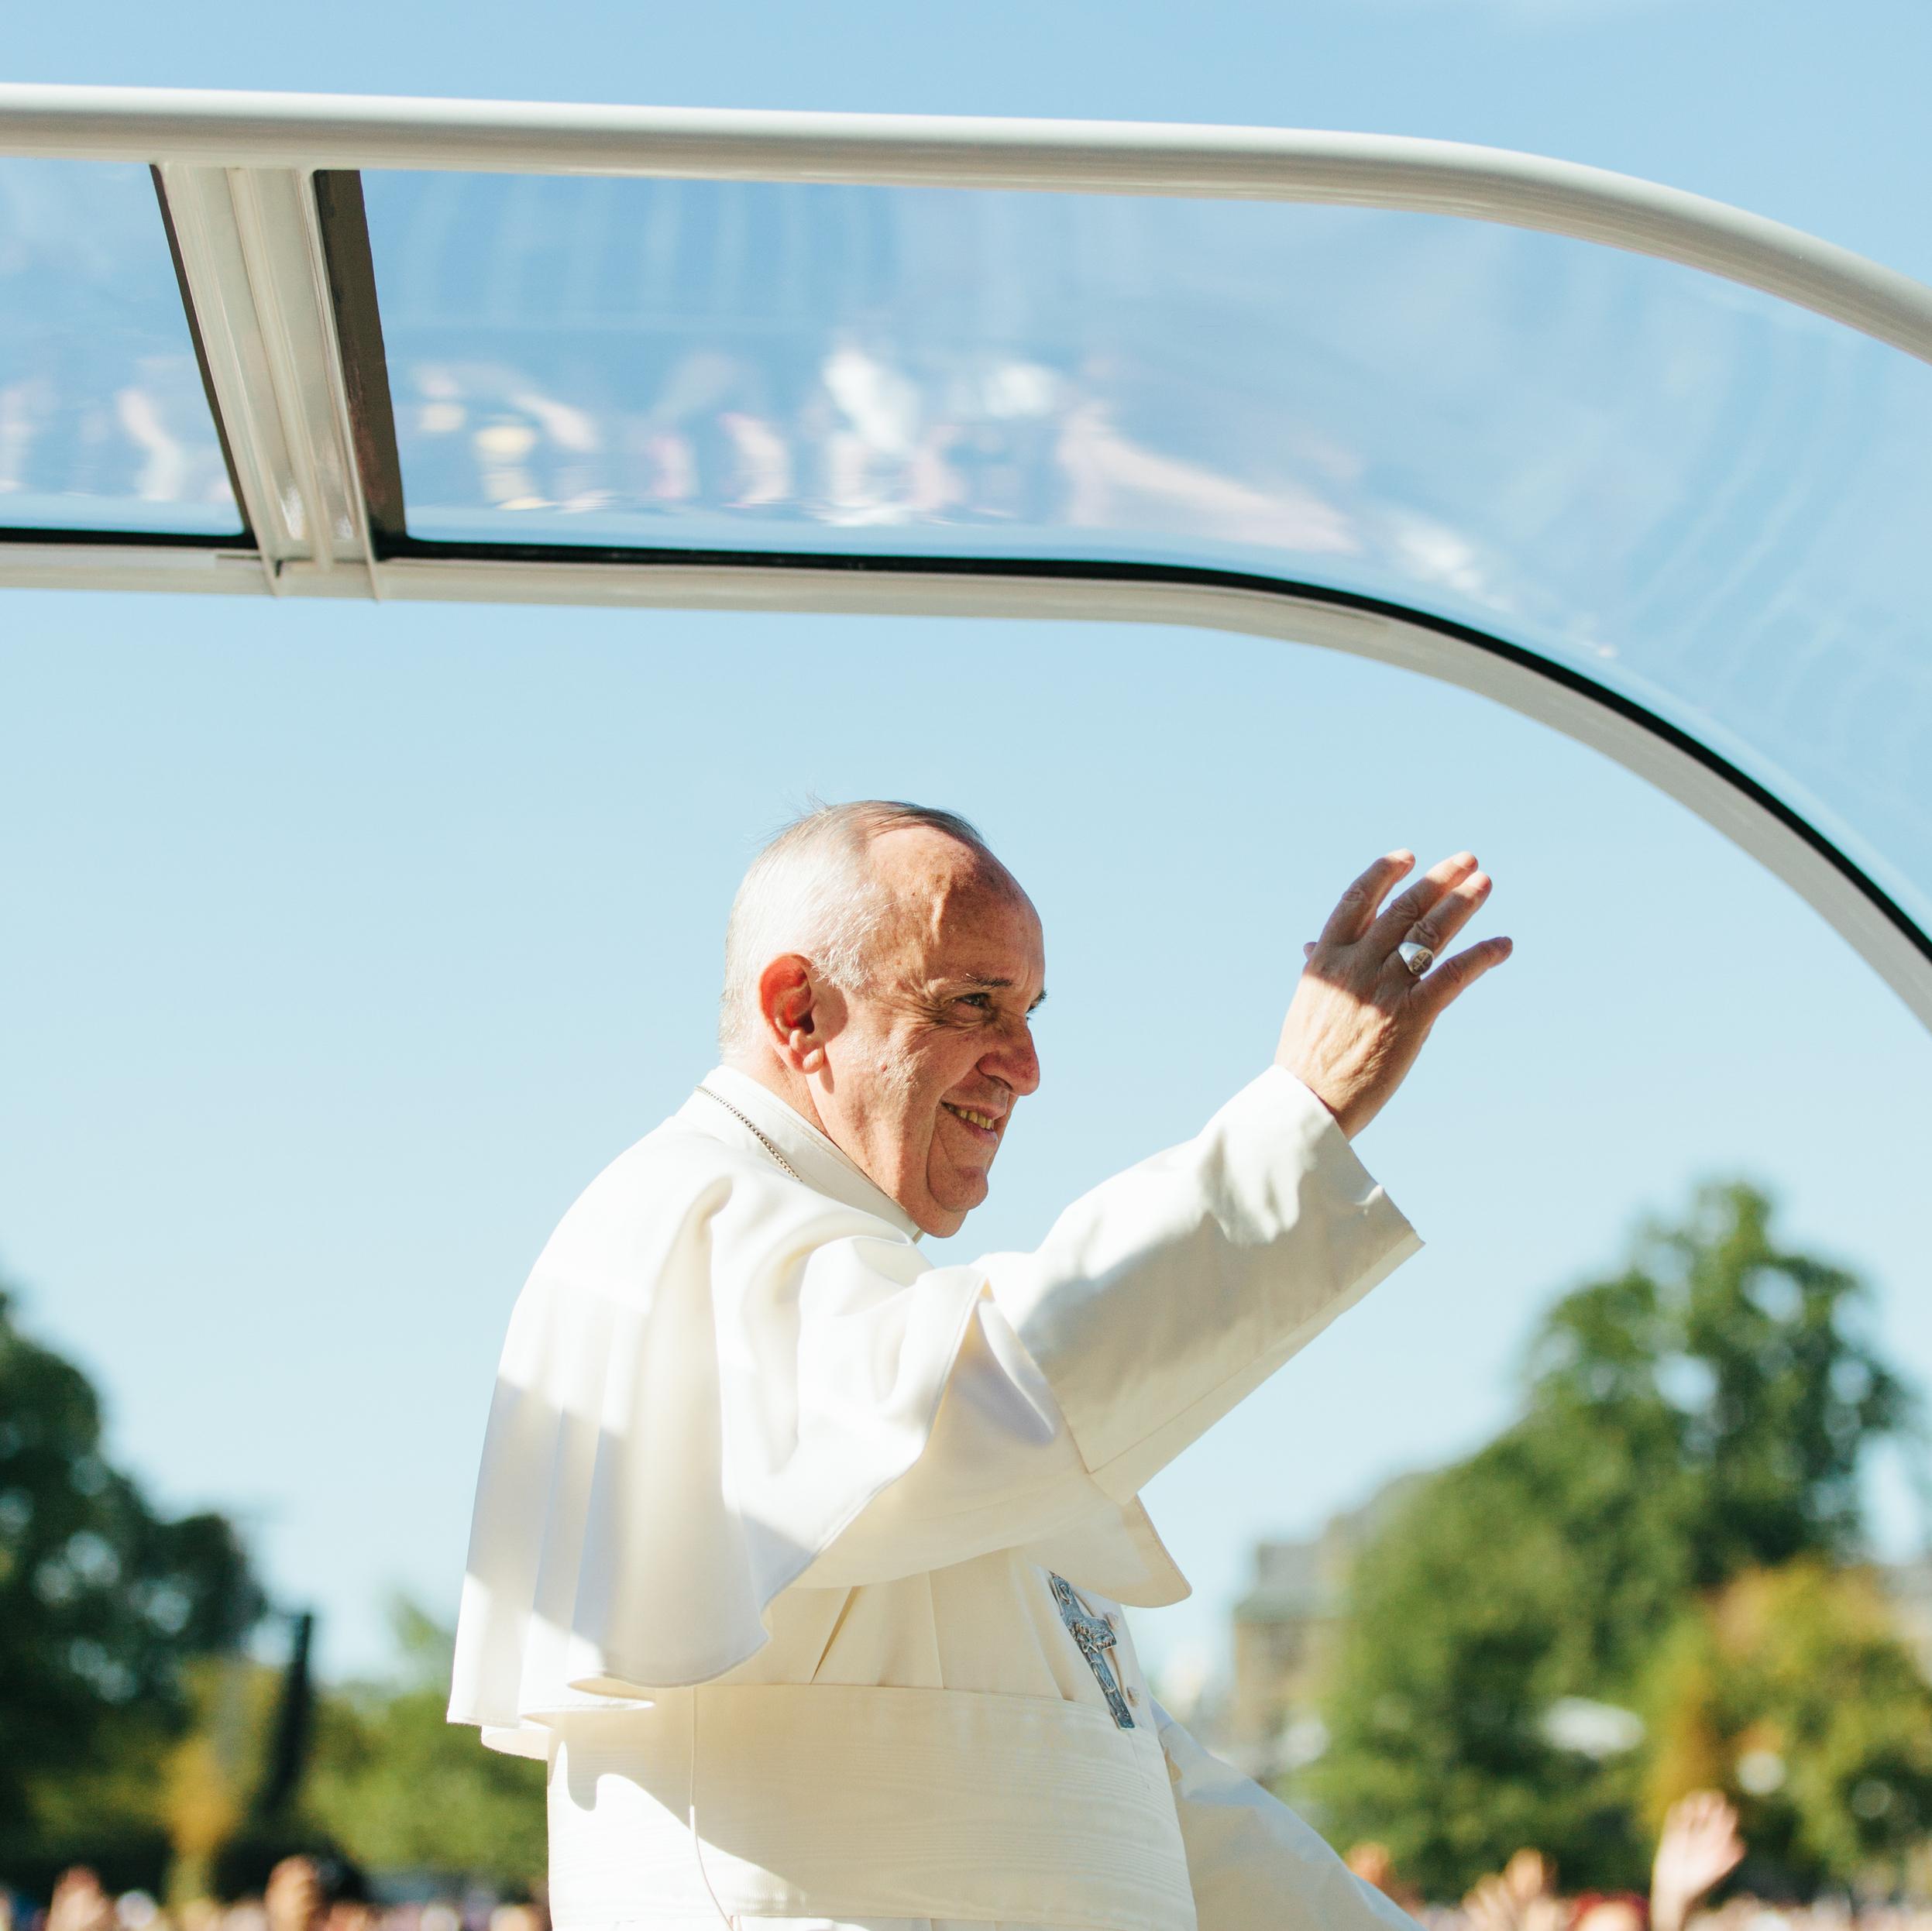 Pope+Francis+in+Washington+DC+by+Branden+Harvey.jpg